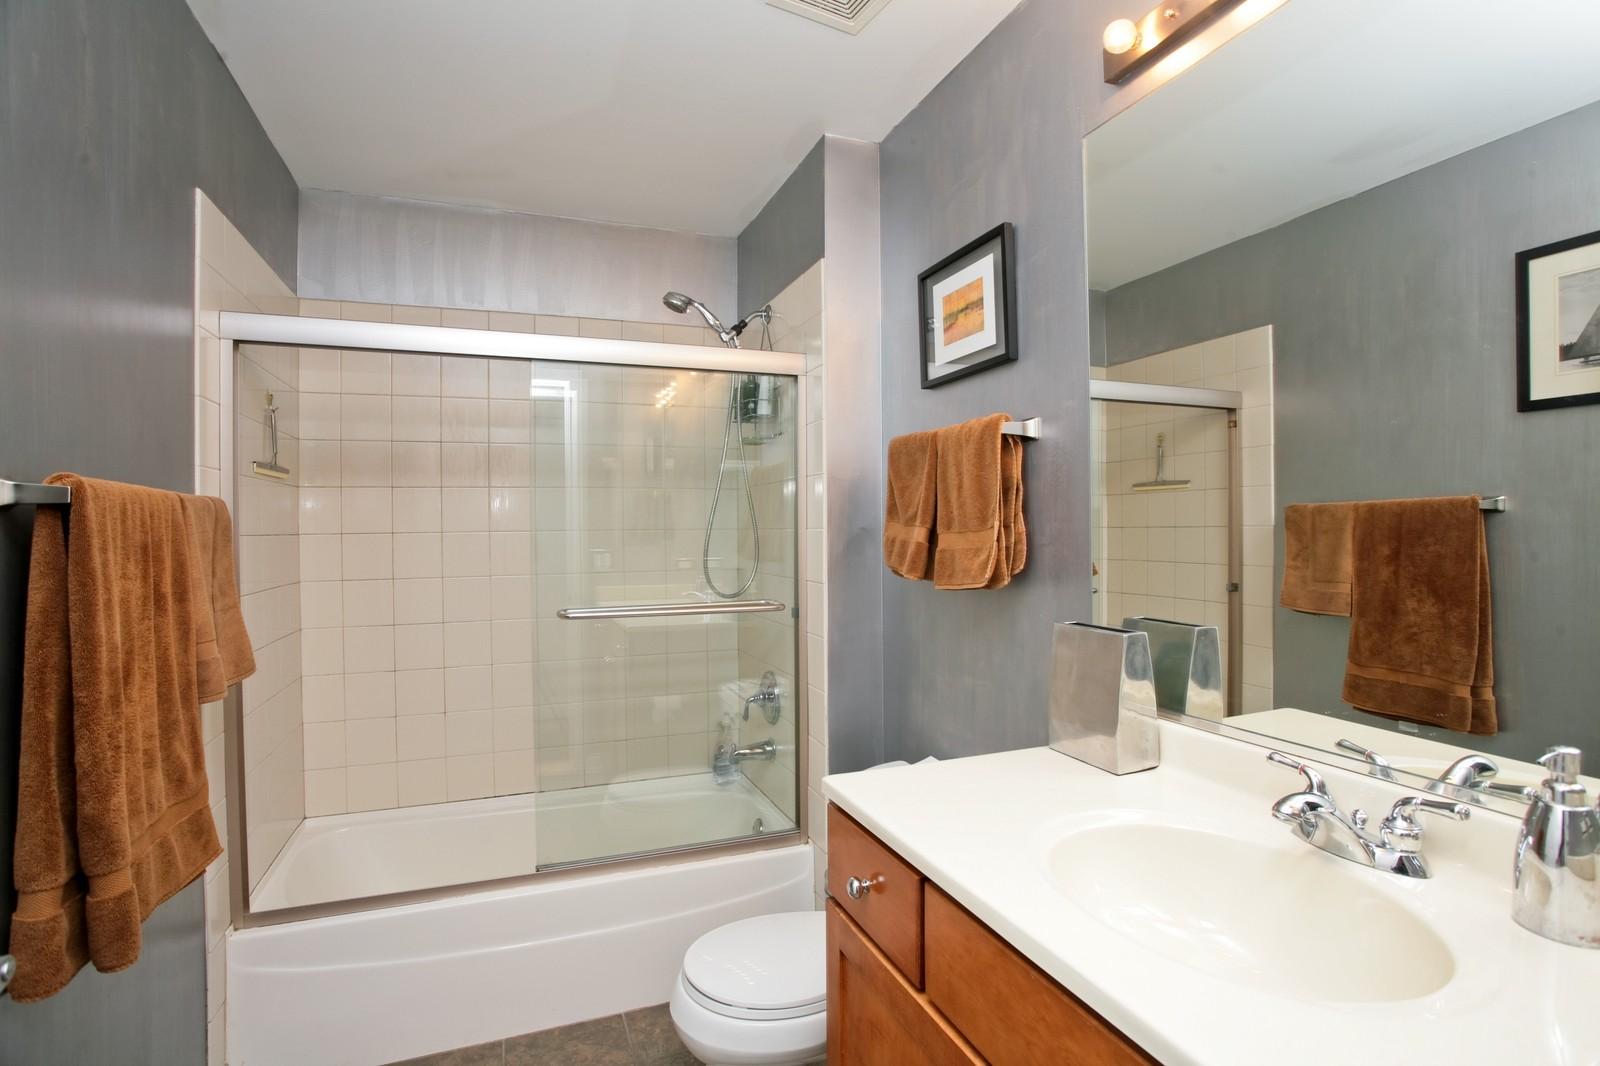 Real Estate Photography - 1000 N Kingsbury, Unit 301, Chicago, IL, 60654 - Bathroom